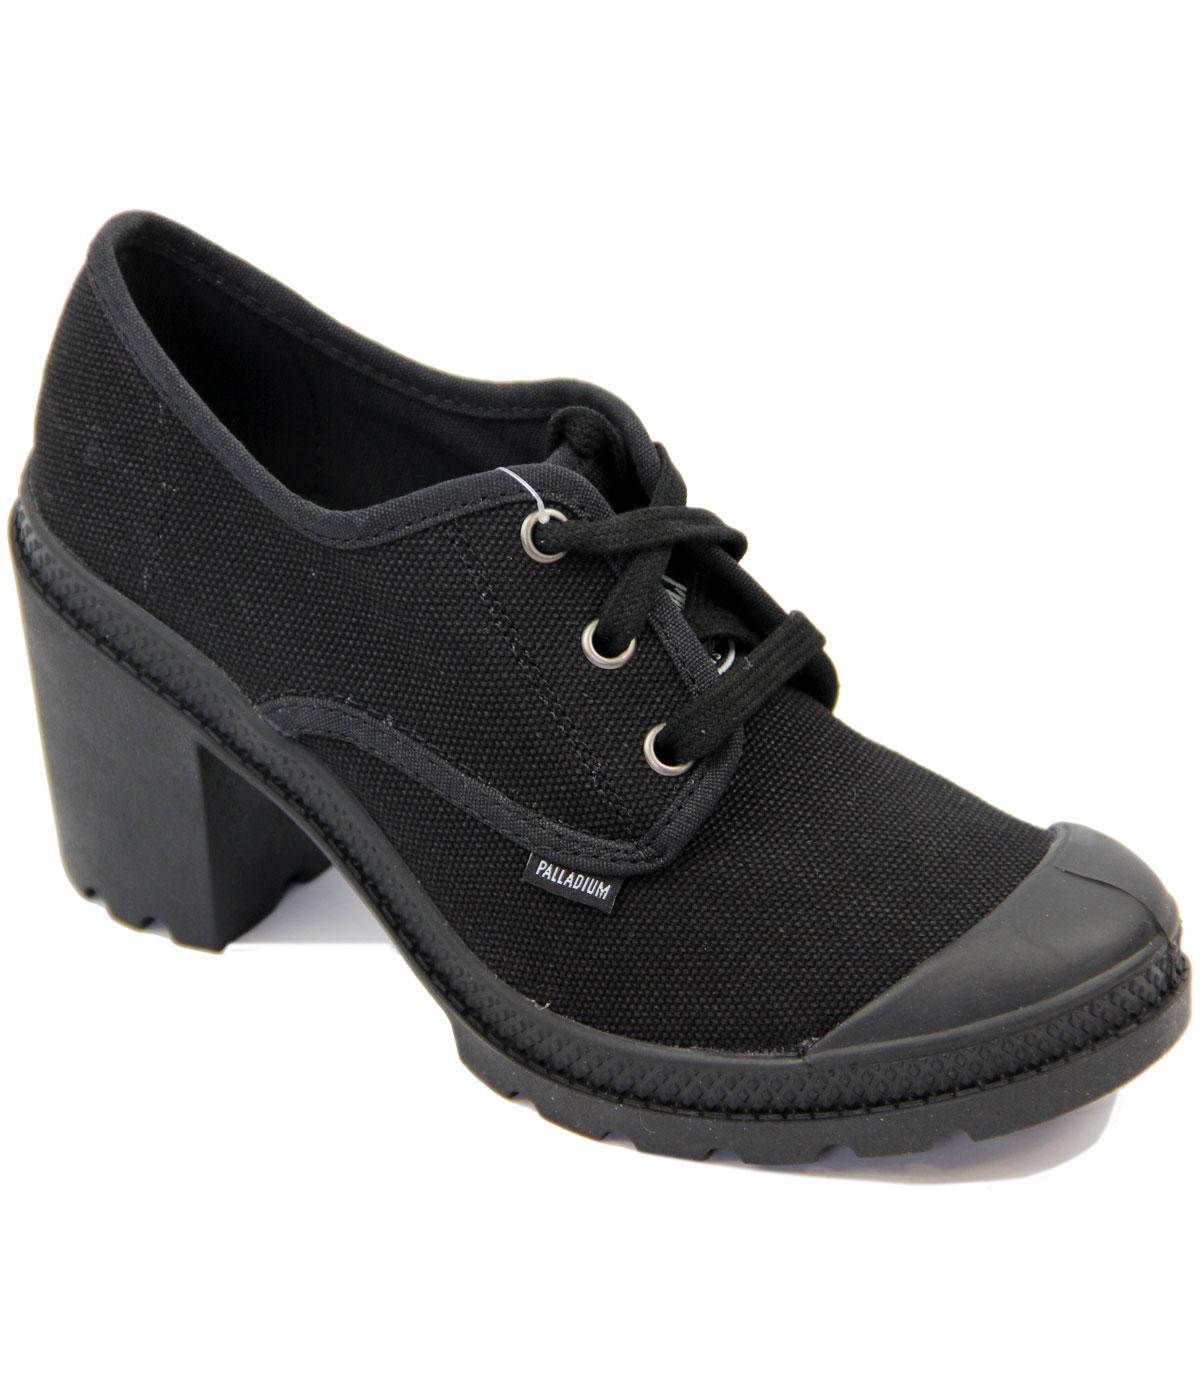 Palladium Shoes Black Friday